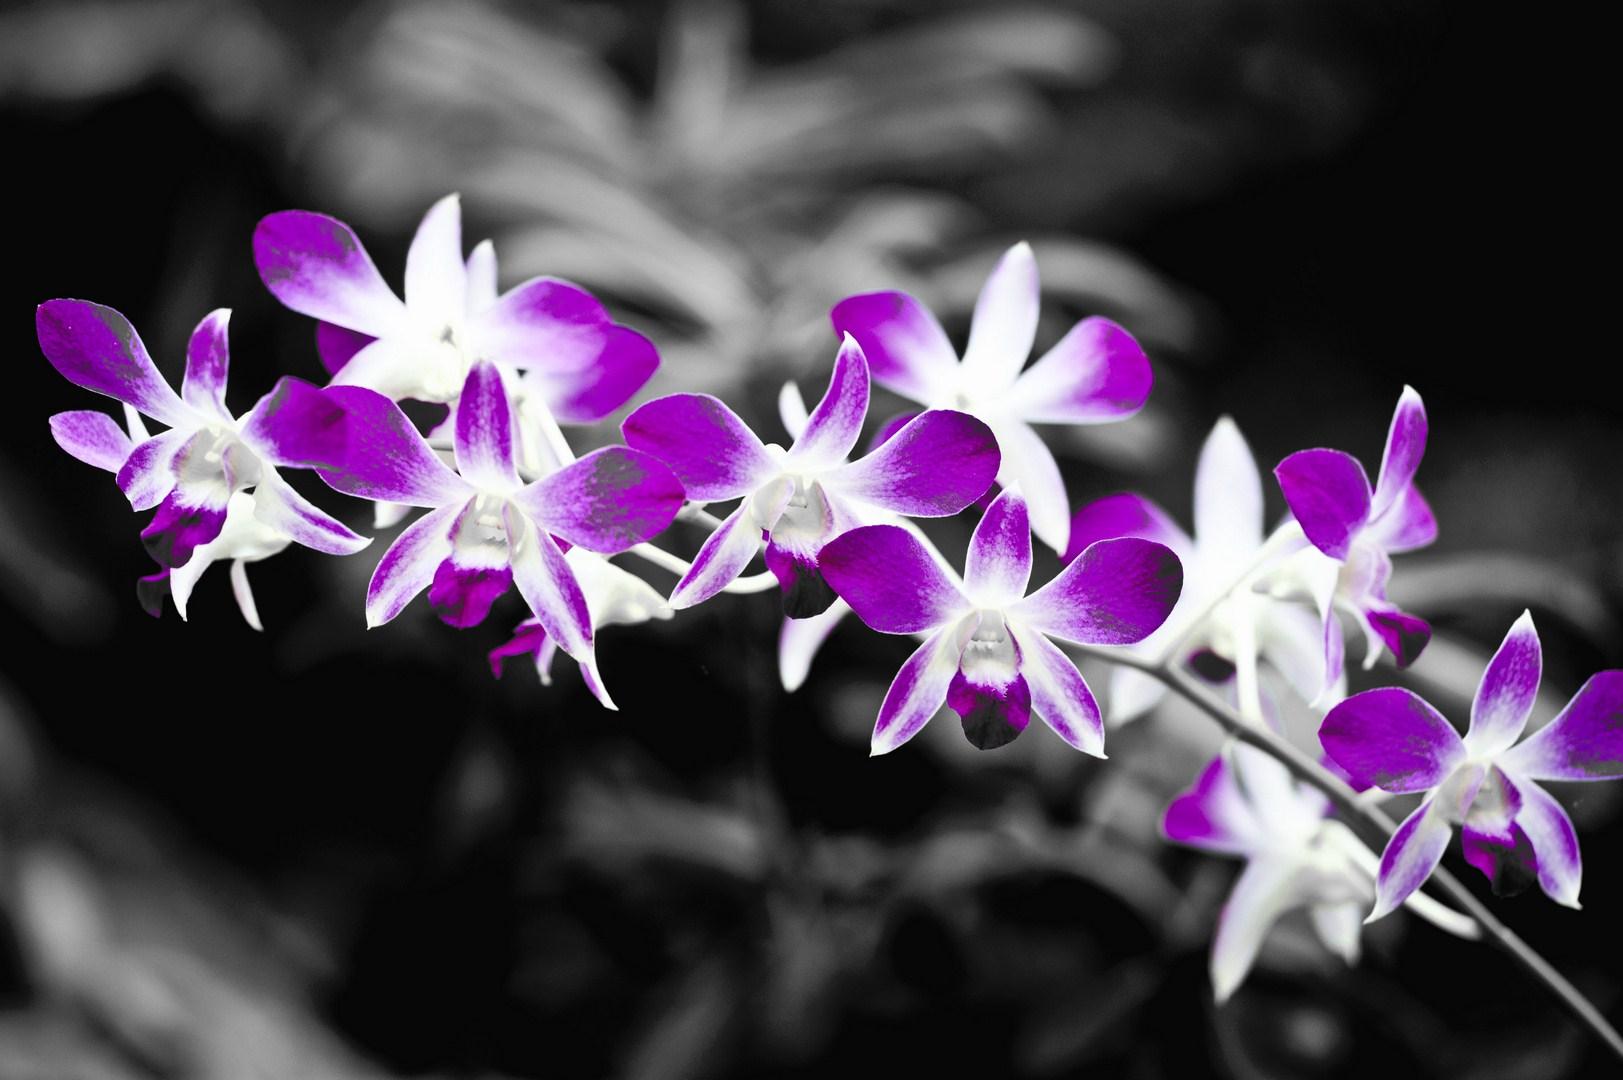 schwarz weiss farbe 5 foto bild pflanzen pilze flechten bl ten kleinpflanzen. Black Bedroom Furniture Sets. Home Design Ideas